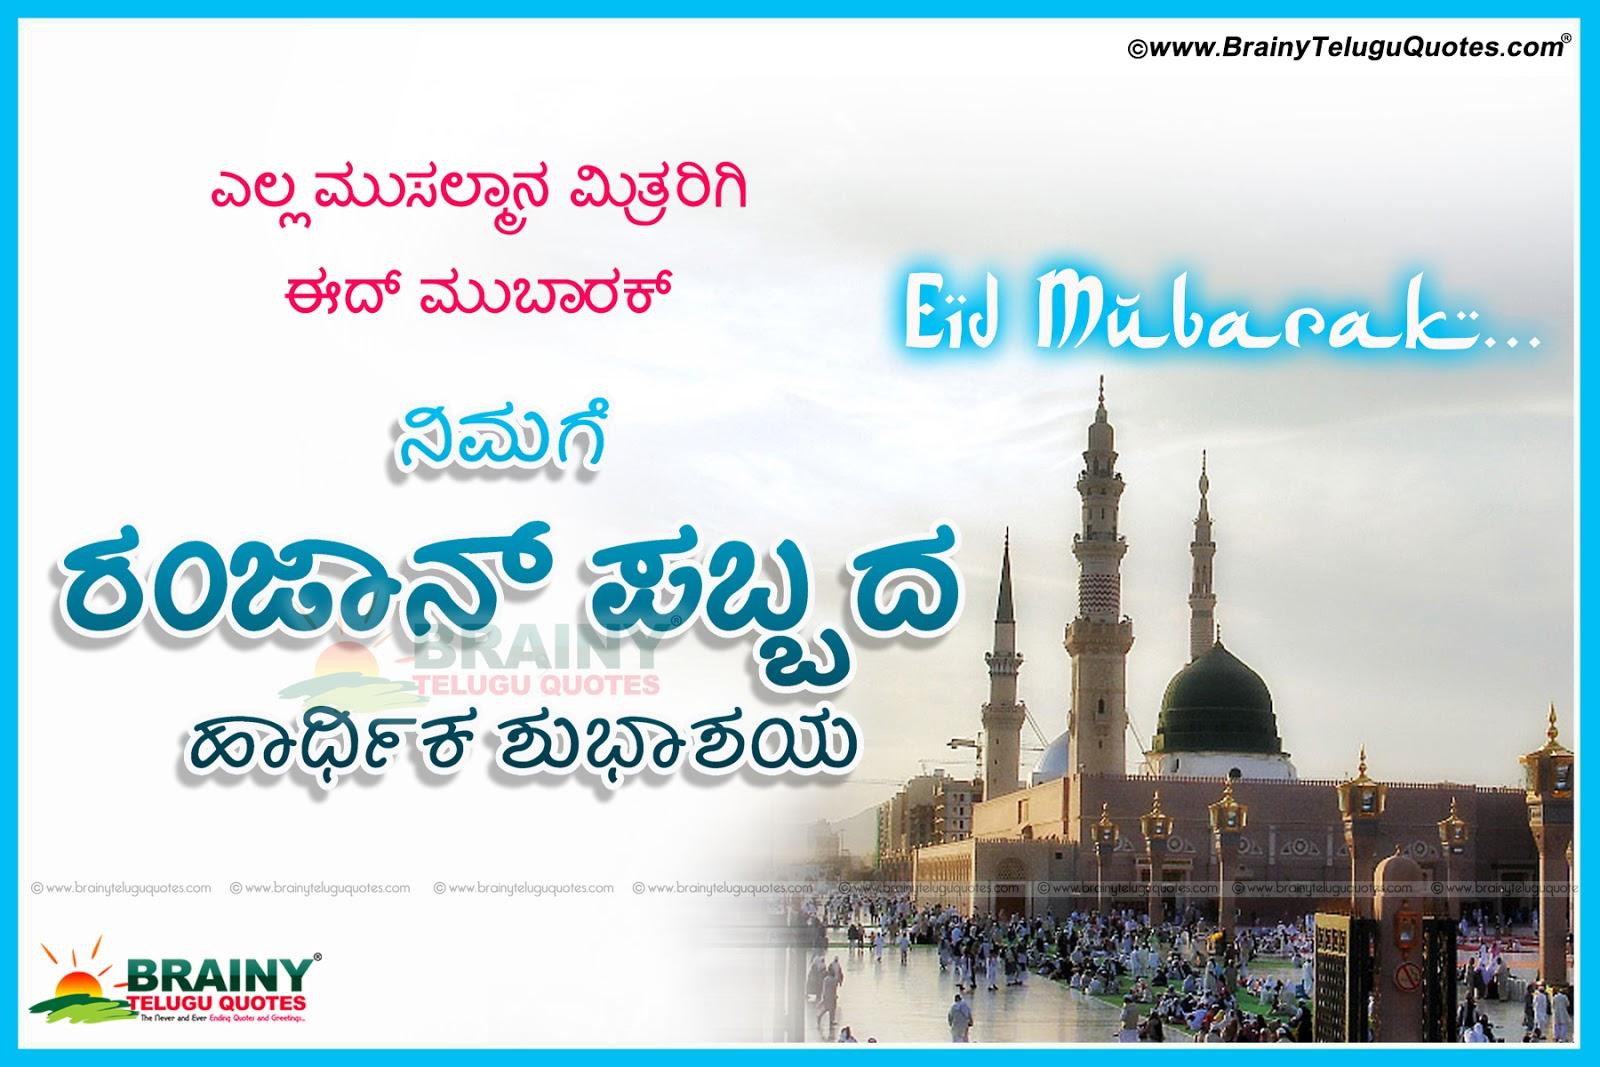 eid mubarak greetings quotes in kannada